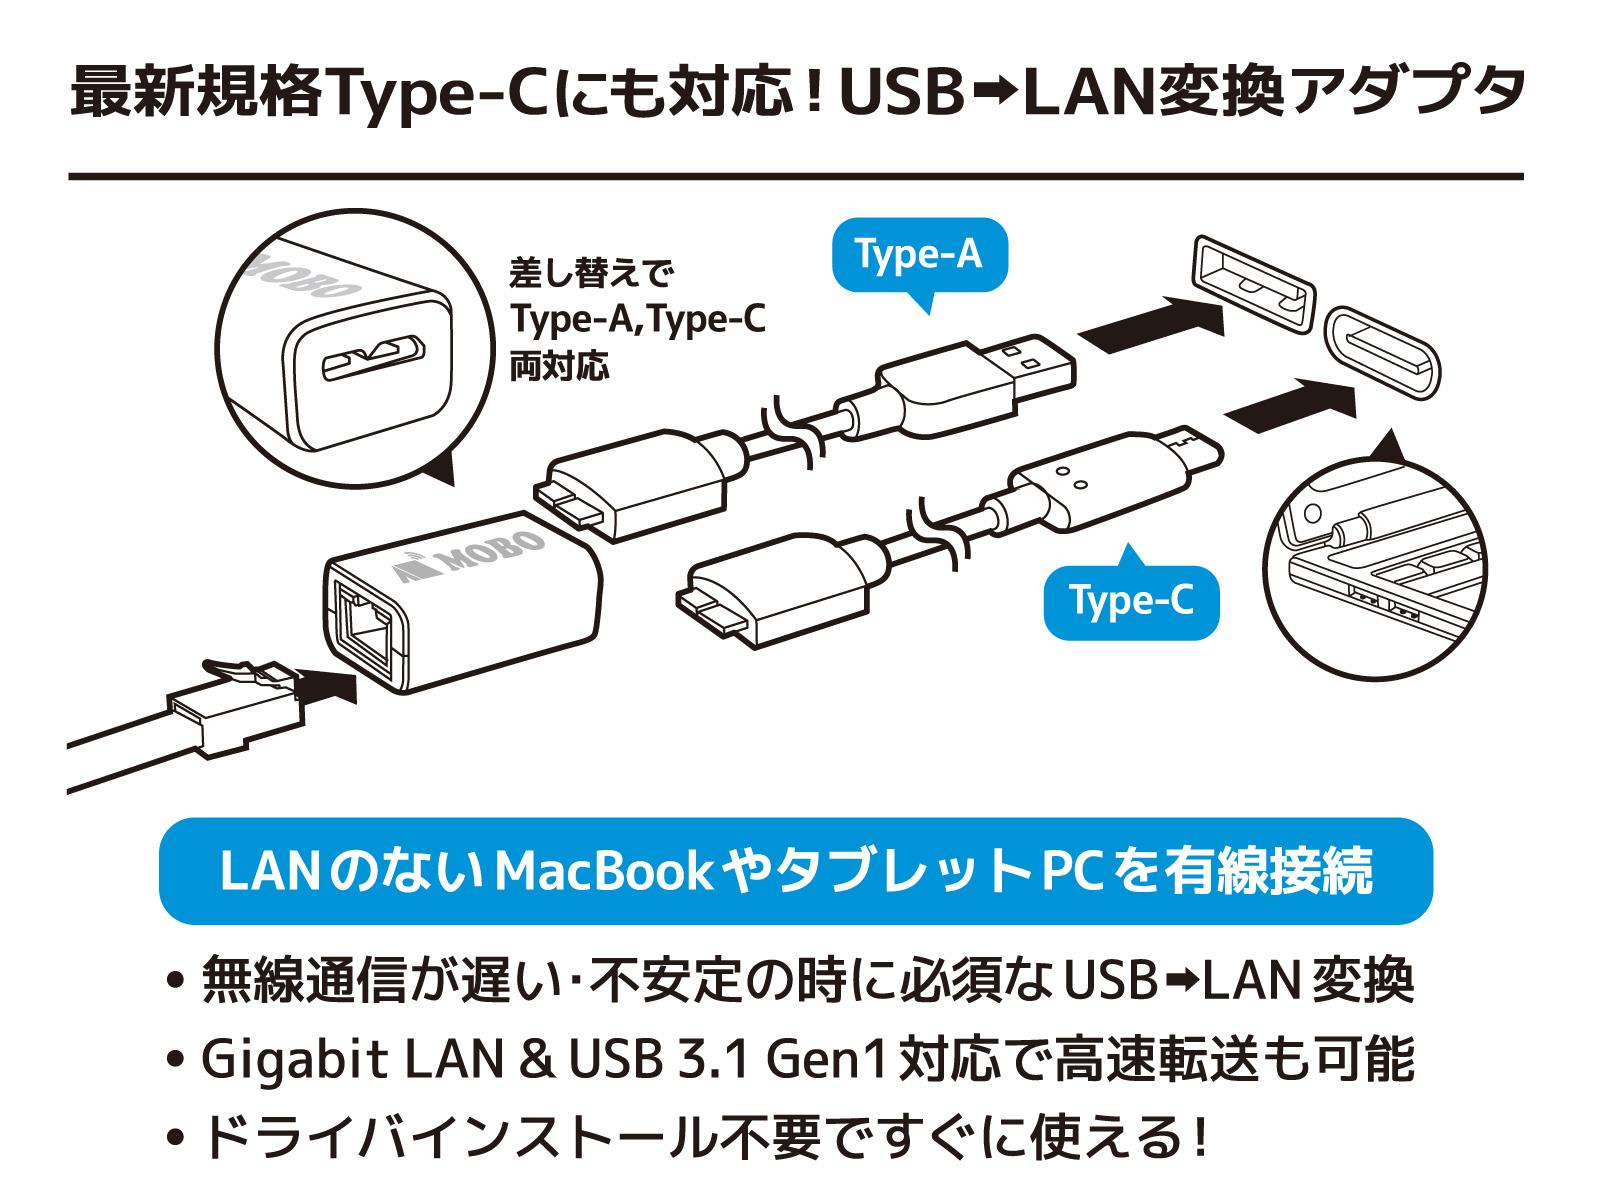 USBtoLAN-18